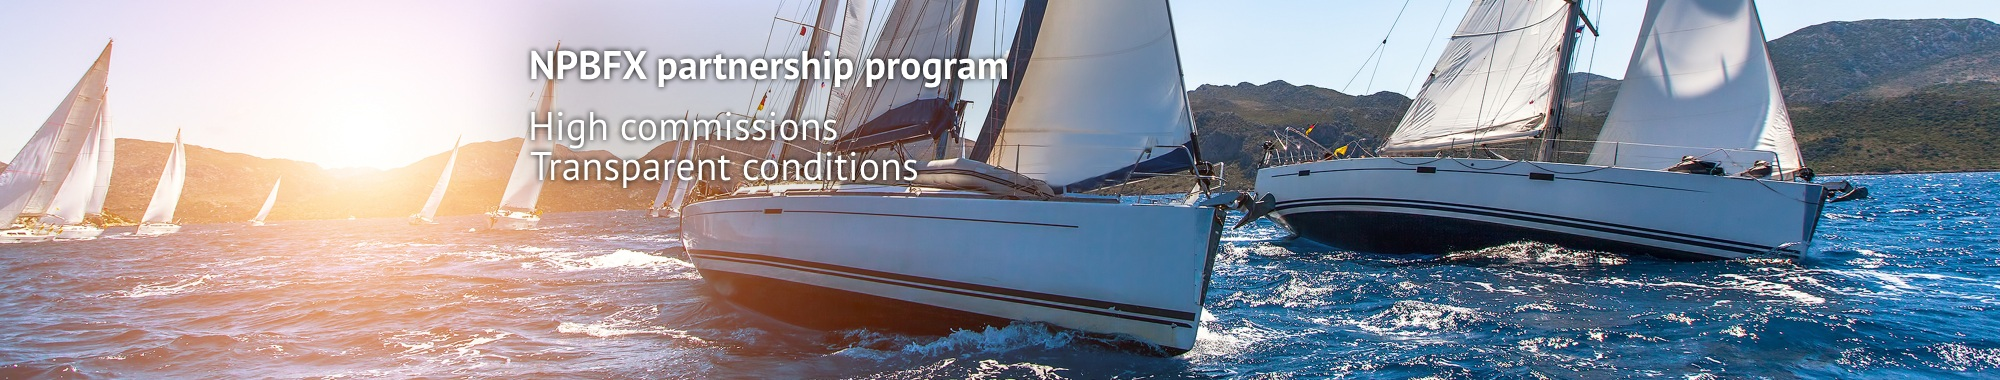 NPBFX www.npbfx.com - Page 2 Partnership